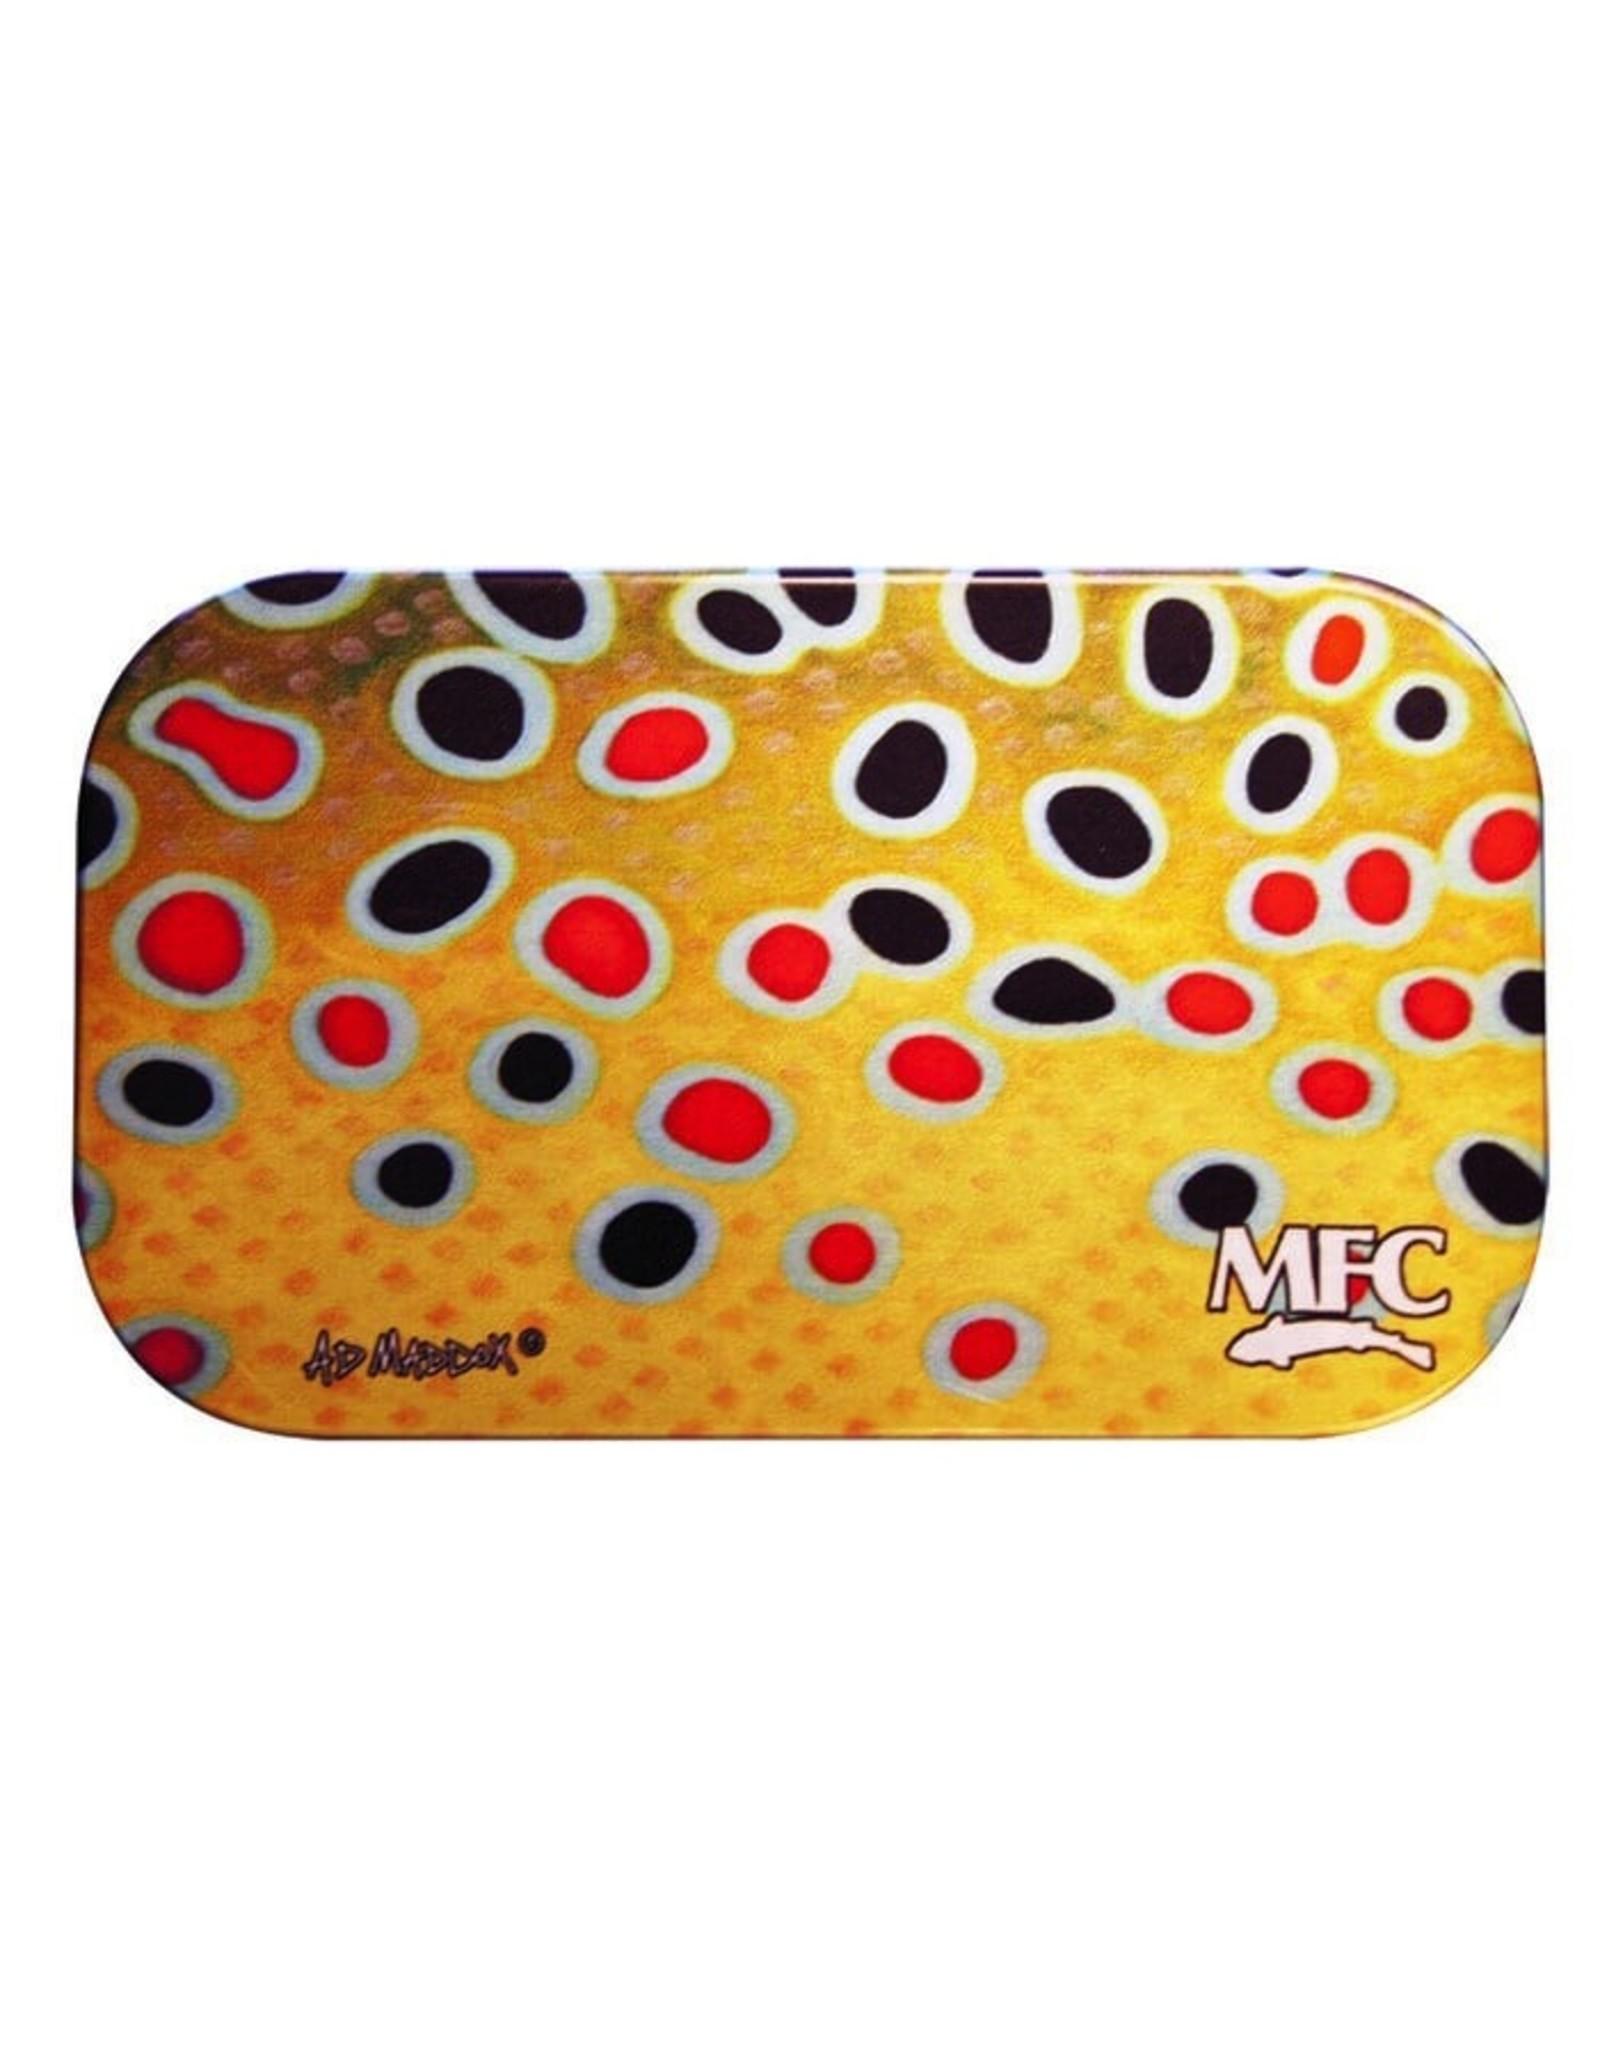 MFC MFC Aluminum Slit Foam Fly Box Maddox's Brown Trout Skin